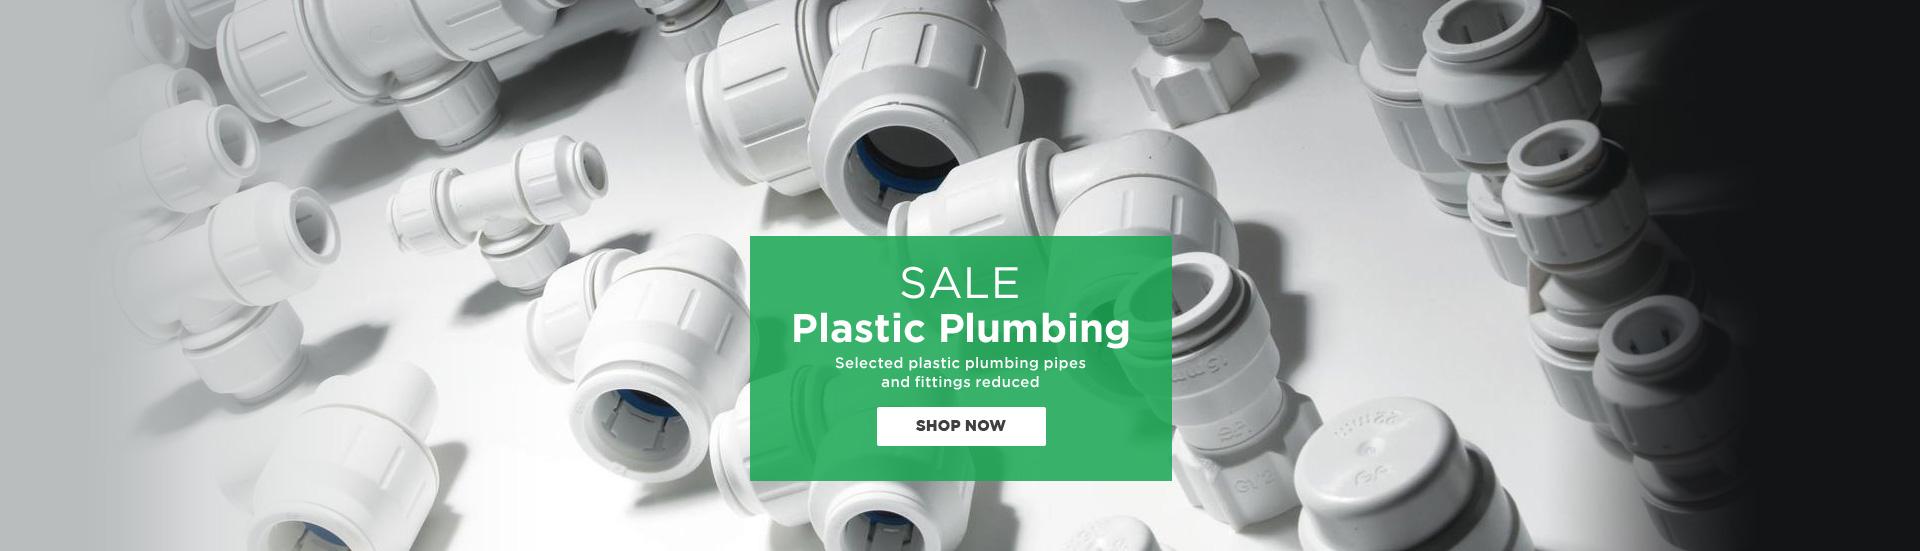 Plastic Plumbing